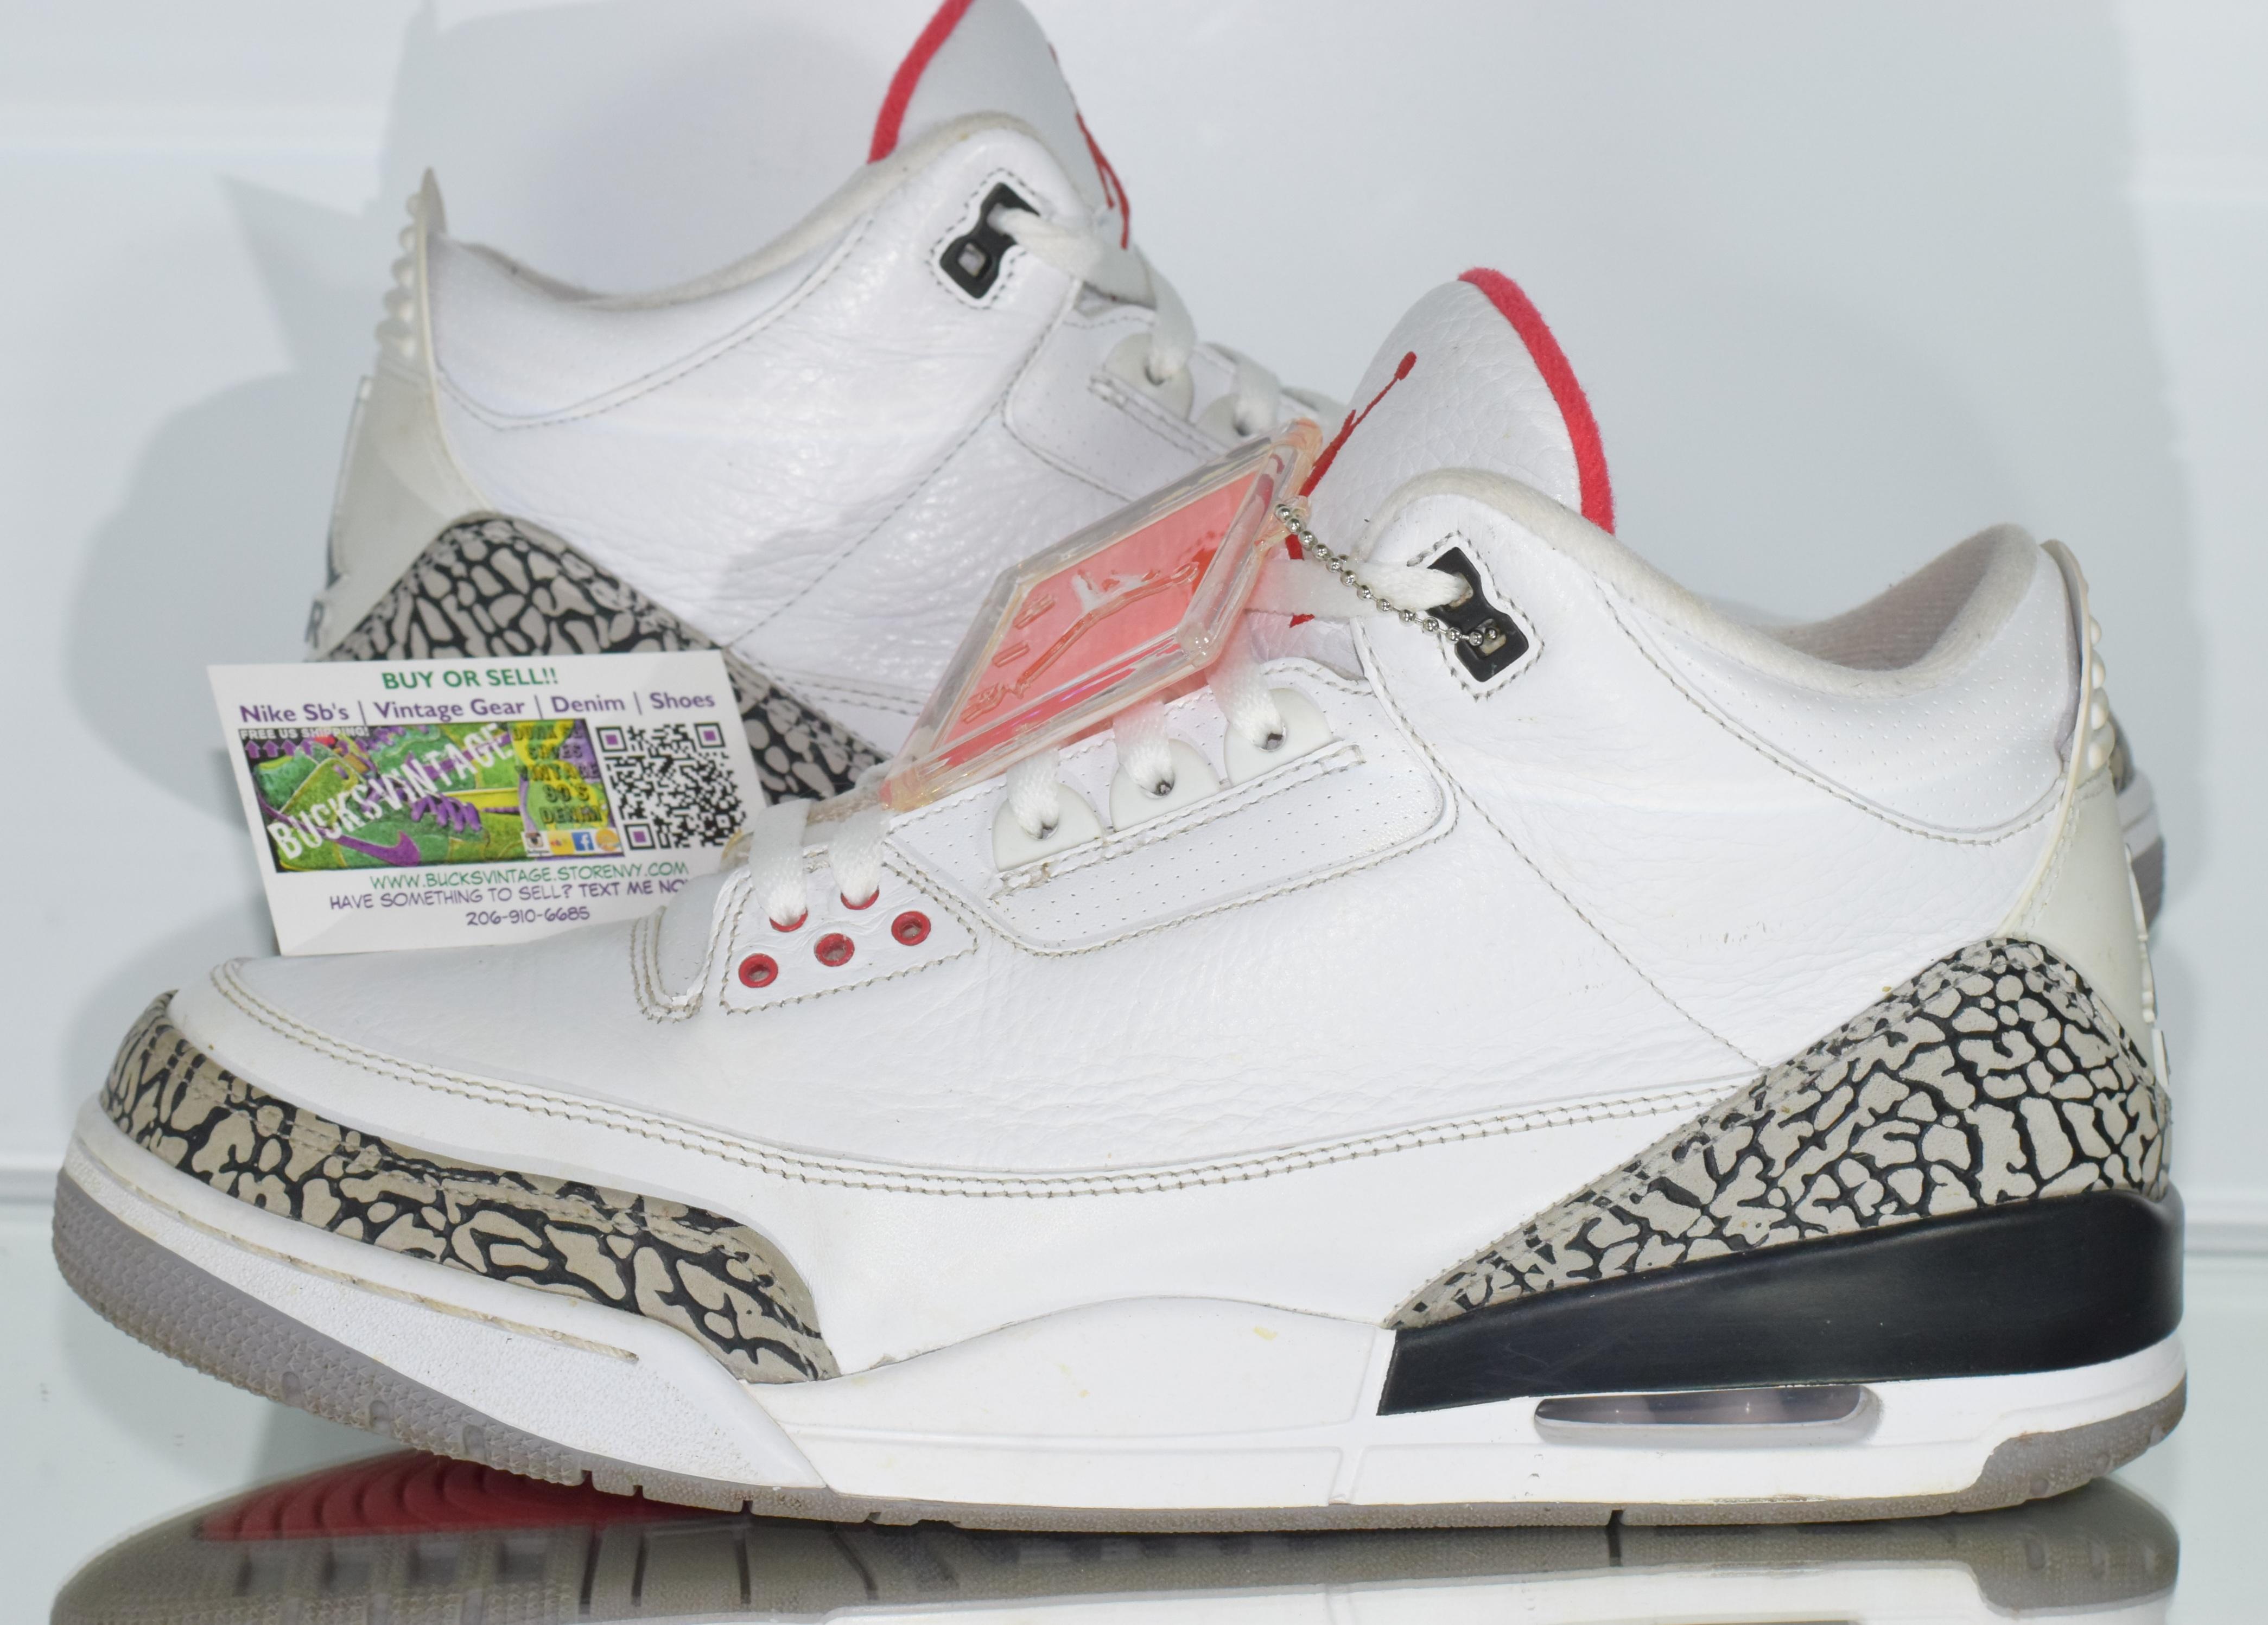 quality design 033ab 68dd4 Size 12 | 2011 Nike Air Jordan 3 White Cement Elephant Print from  BucksVintage